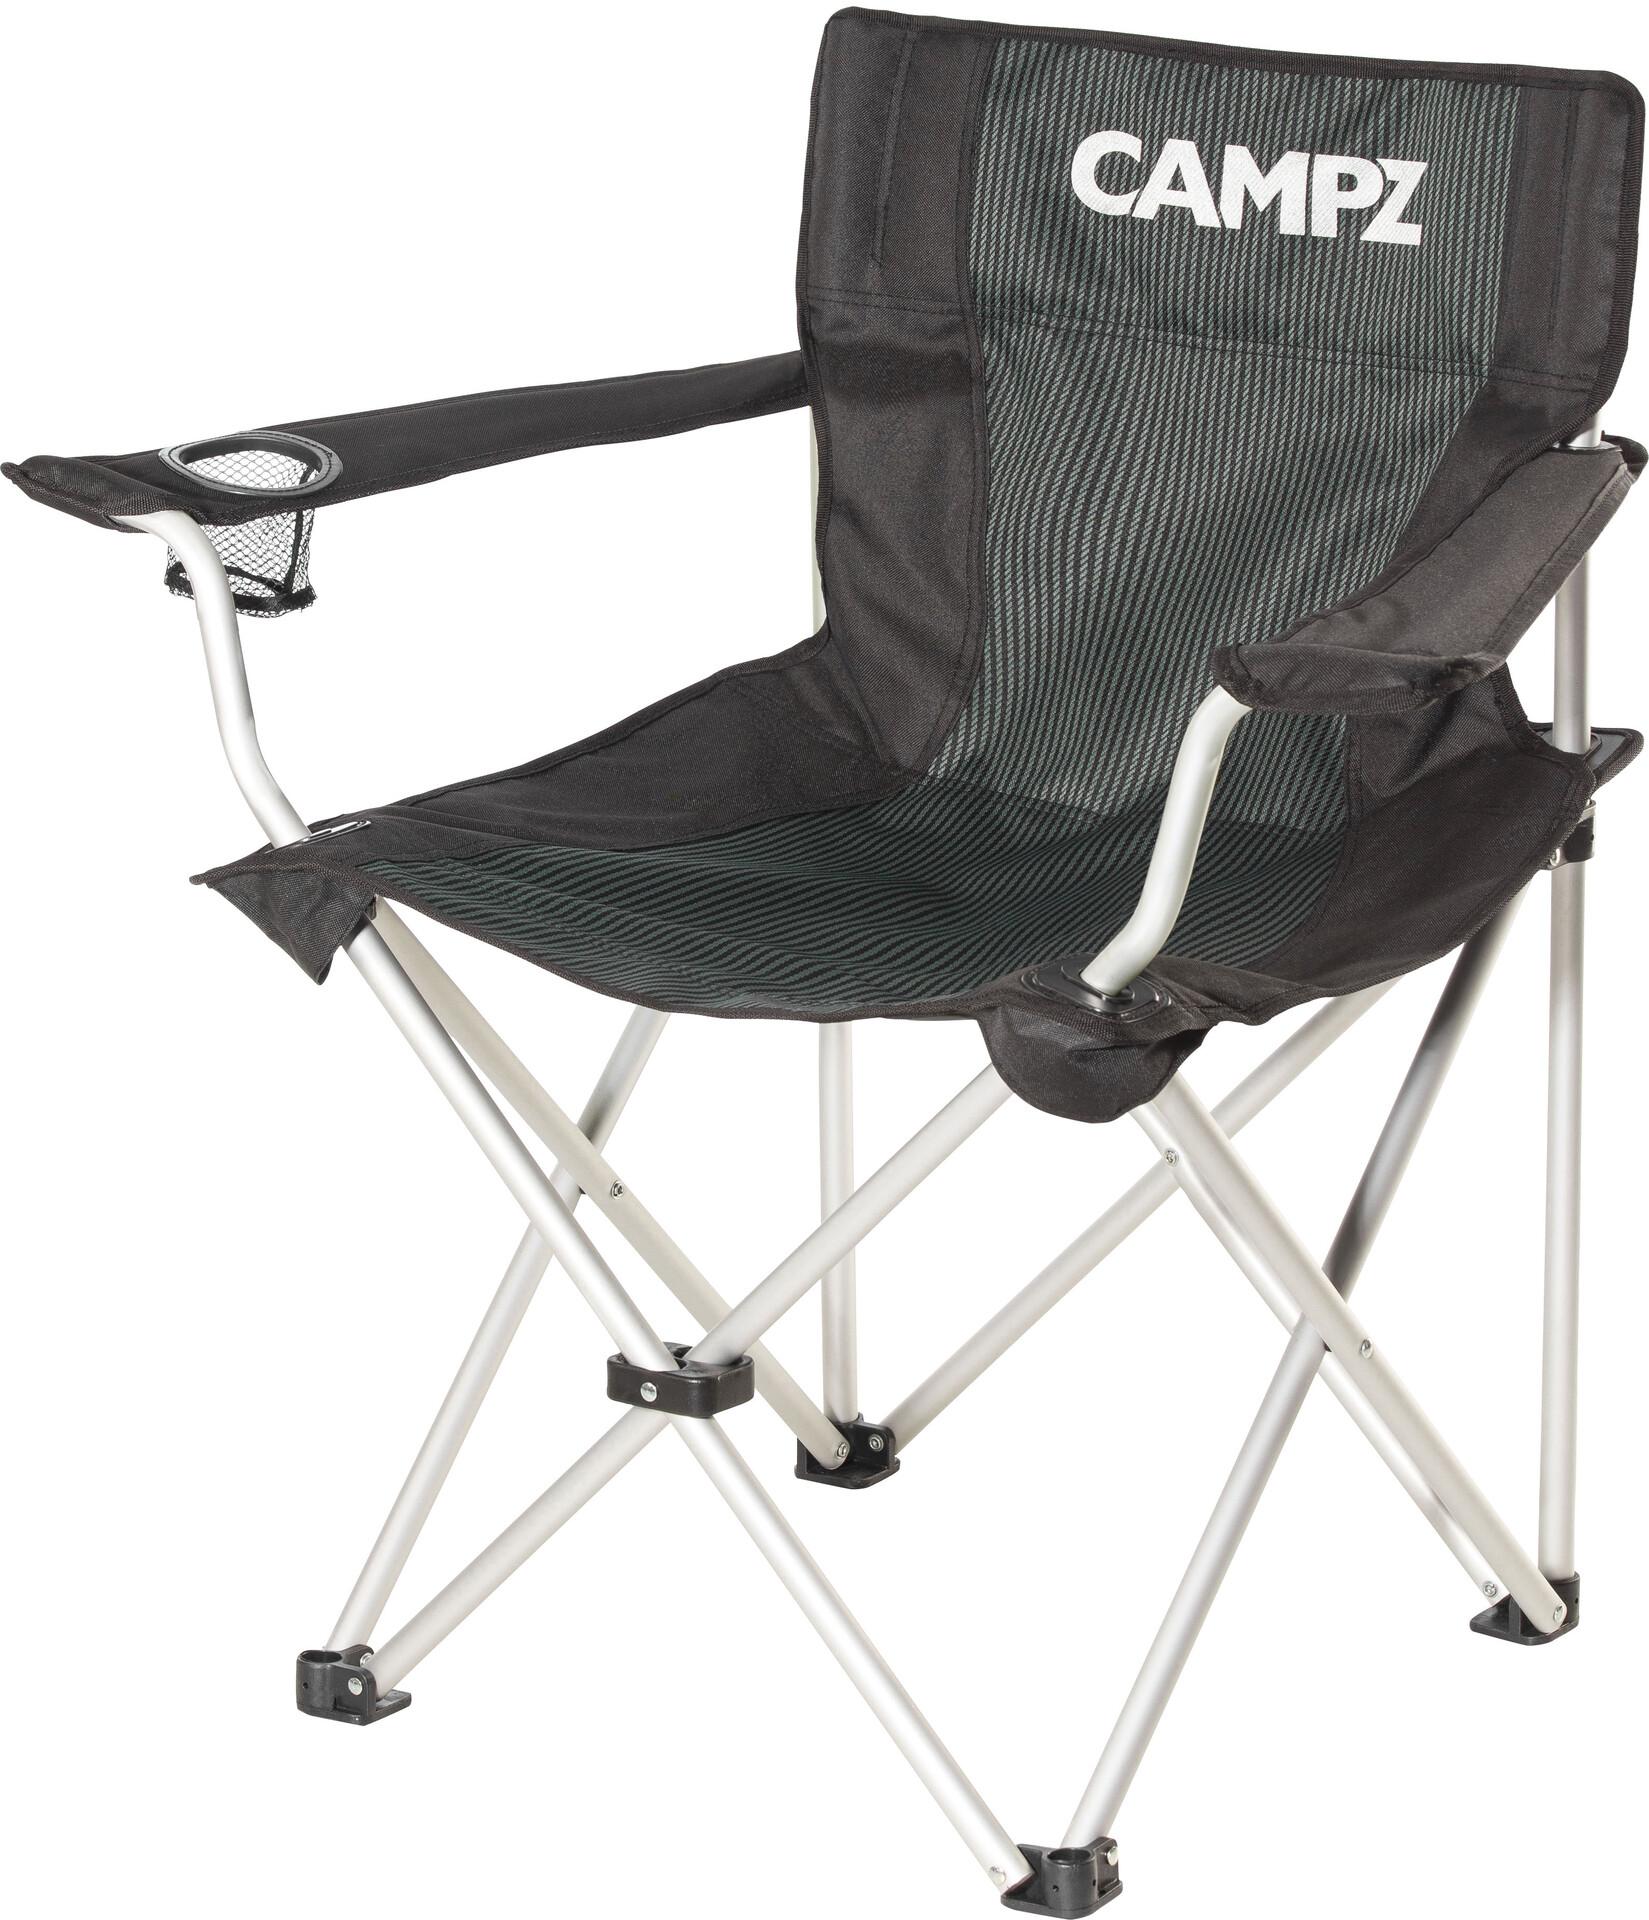 Chaise AluminiumBlack Campz Chaise Pliante En Campz En Pliante R3A5jL4